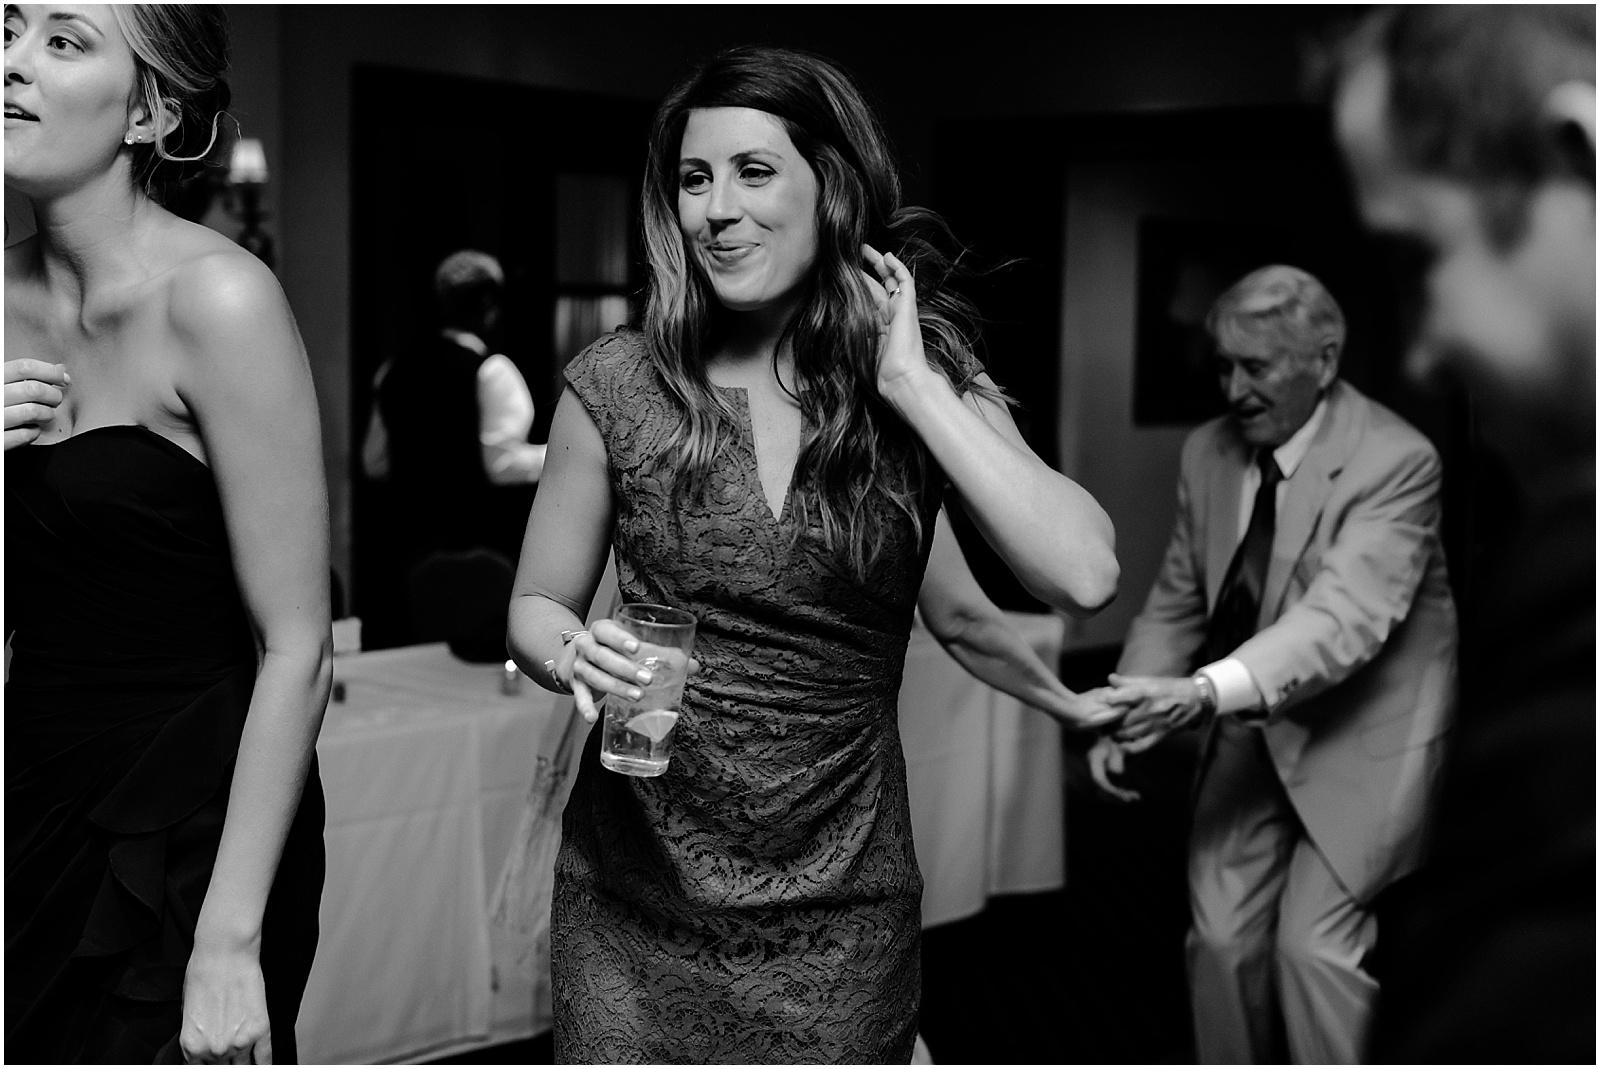 glen_echo_st_louis_mo_wedding_0143.jpg